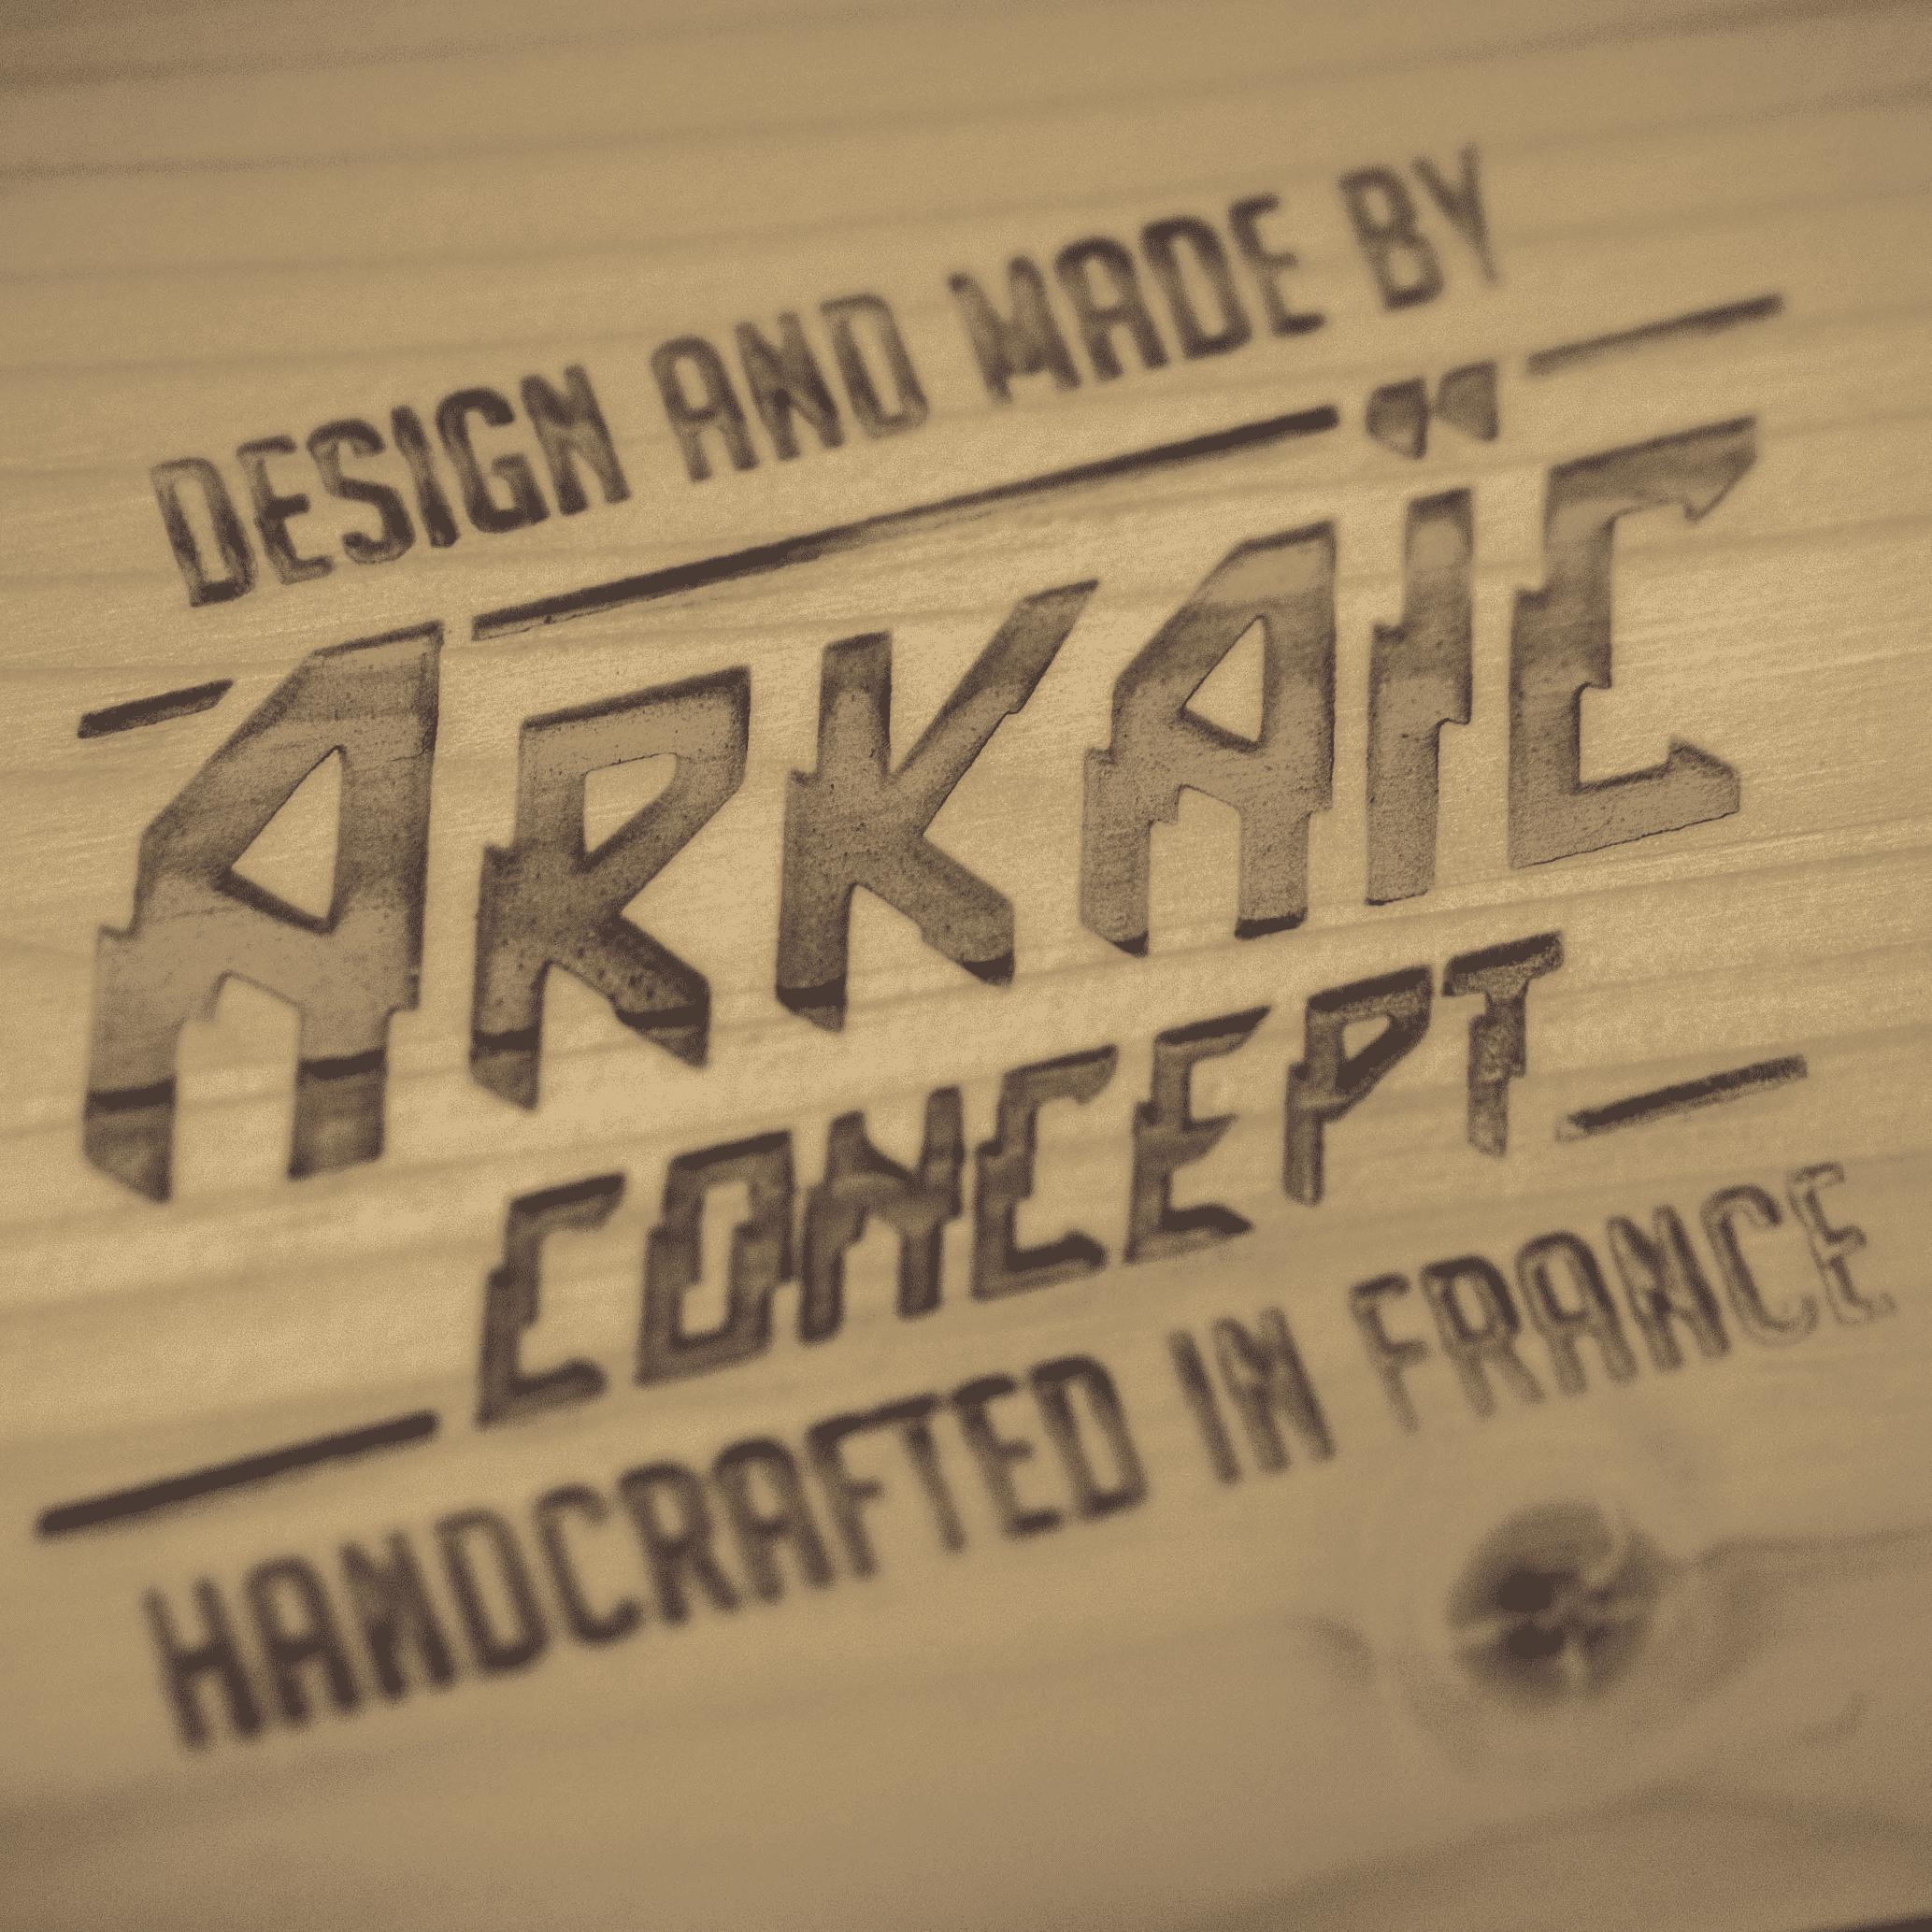 Atelier de production de skateboards arkaic concept Collection 2019 made in france & eco-friendly france lyon gravure laser lyon caluire atelier arkaic skateboard